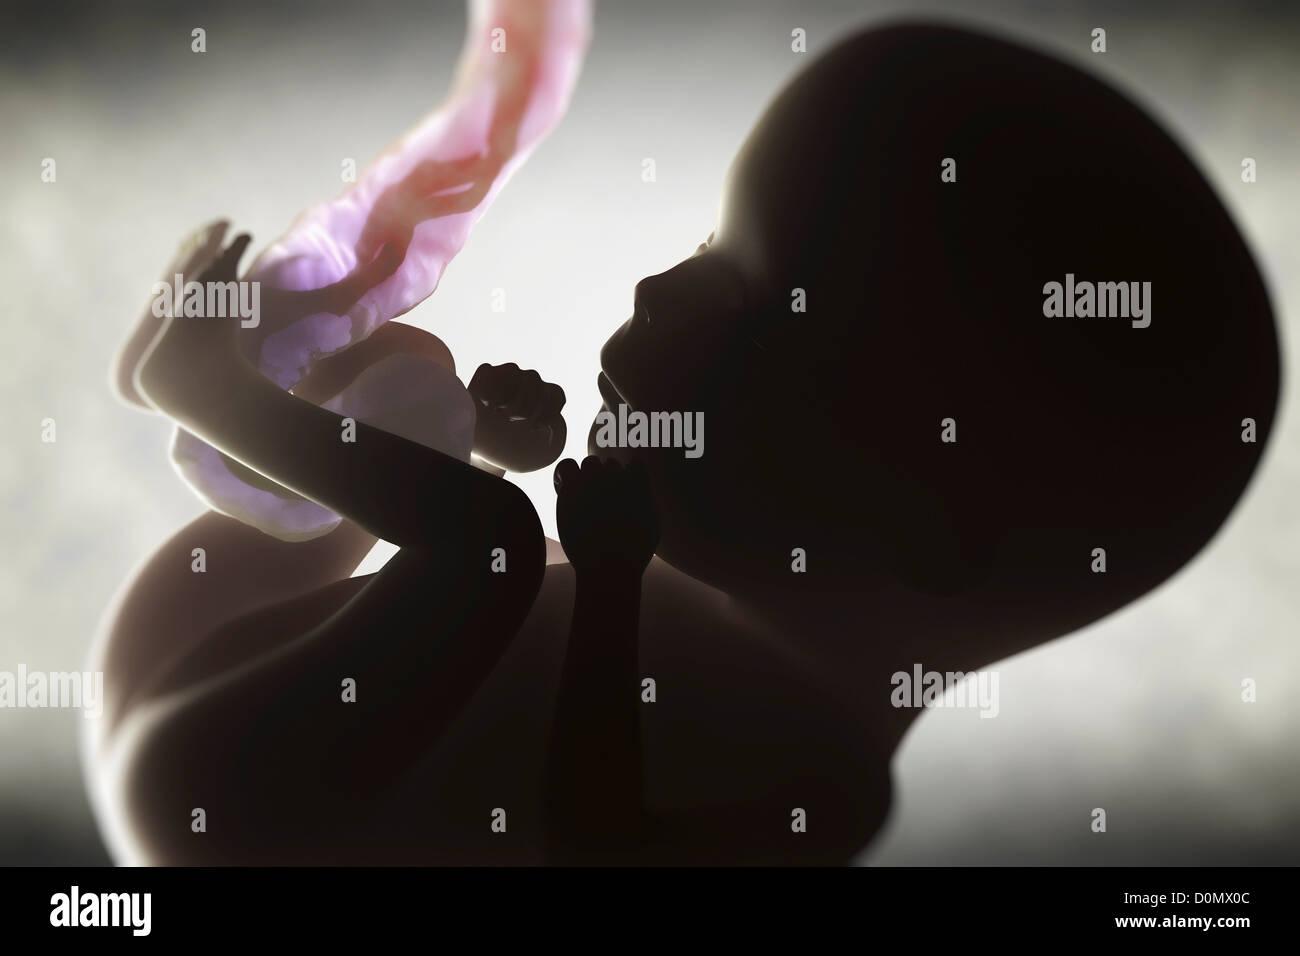 Digital Illustration of a fetus (Week 15) growing inside the uterus. Stock Photo